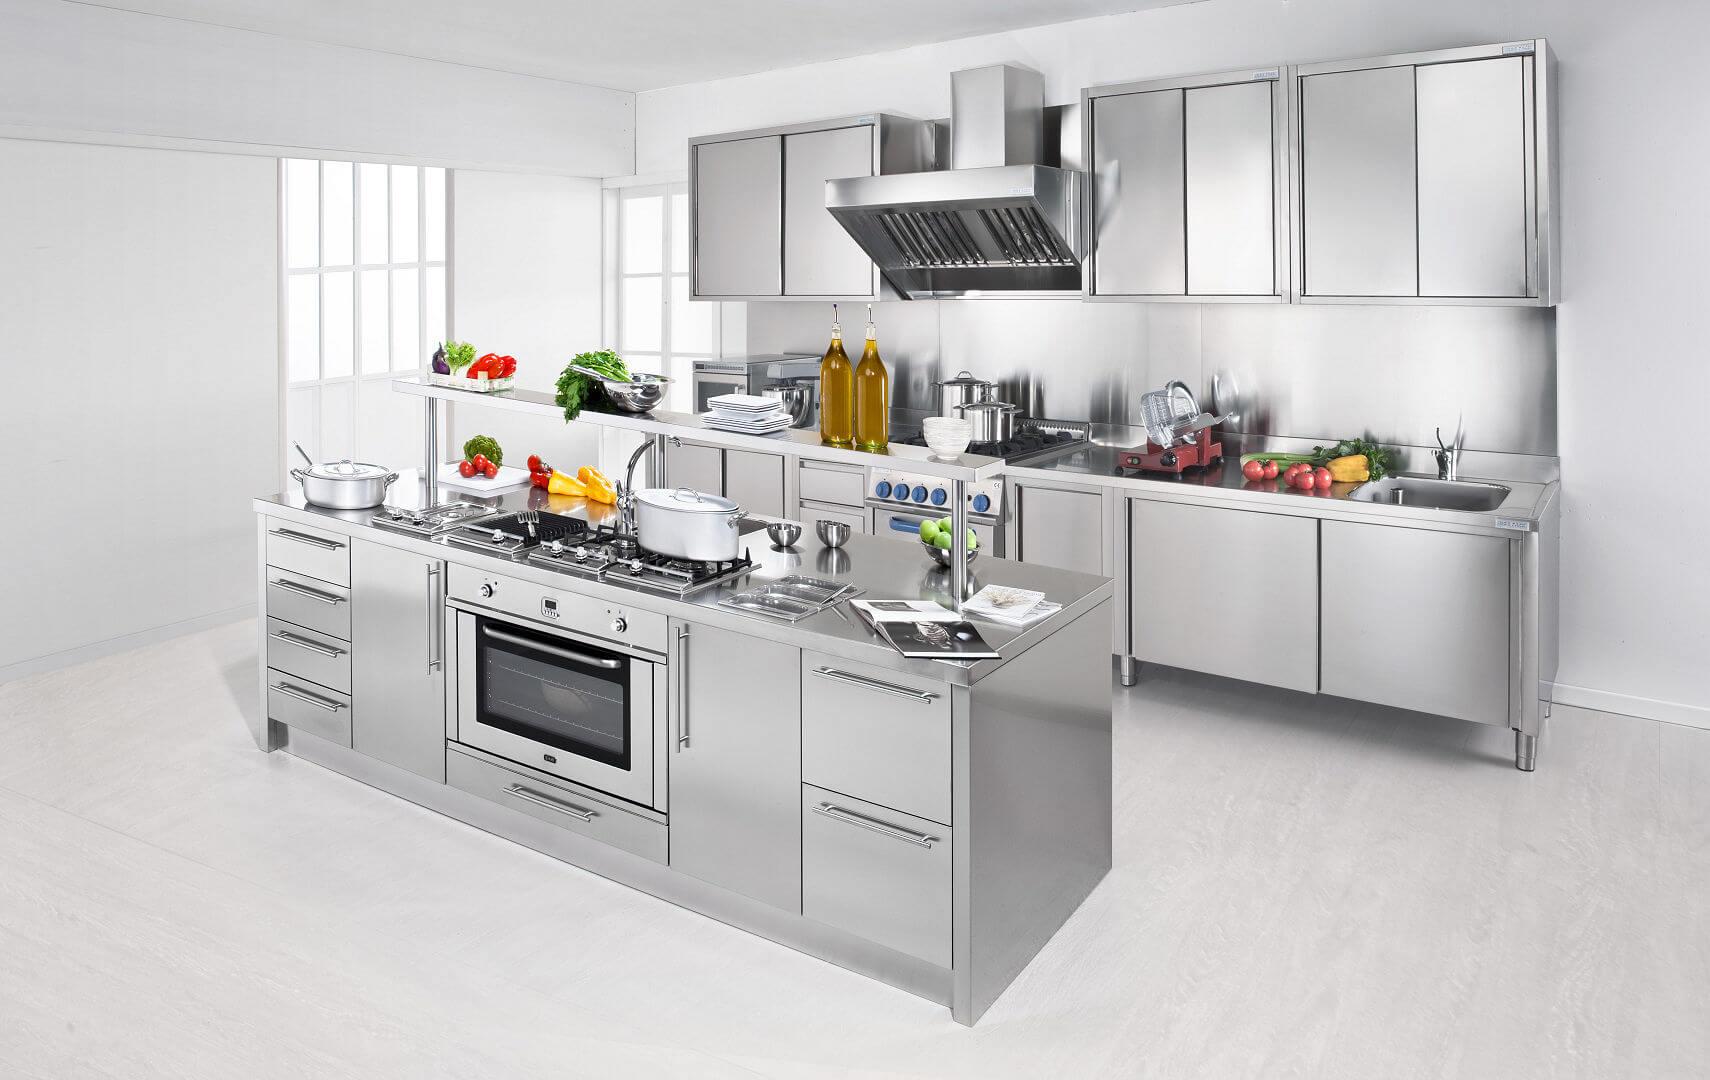 Cucine In Acciaio Per Casa - Design Per La Casa Moderna - Ltay.net